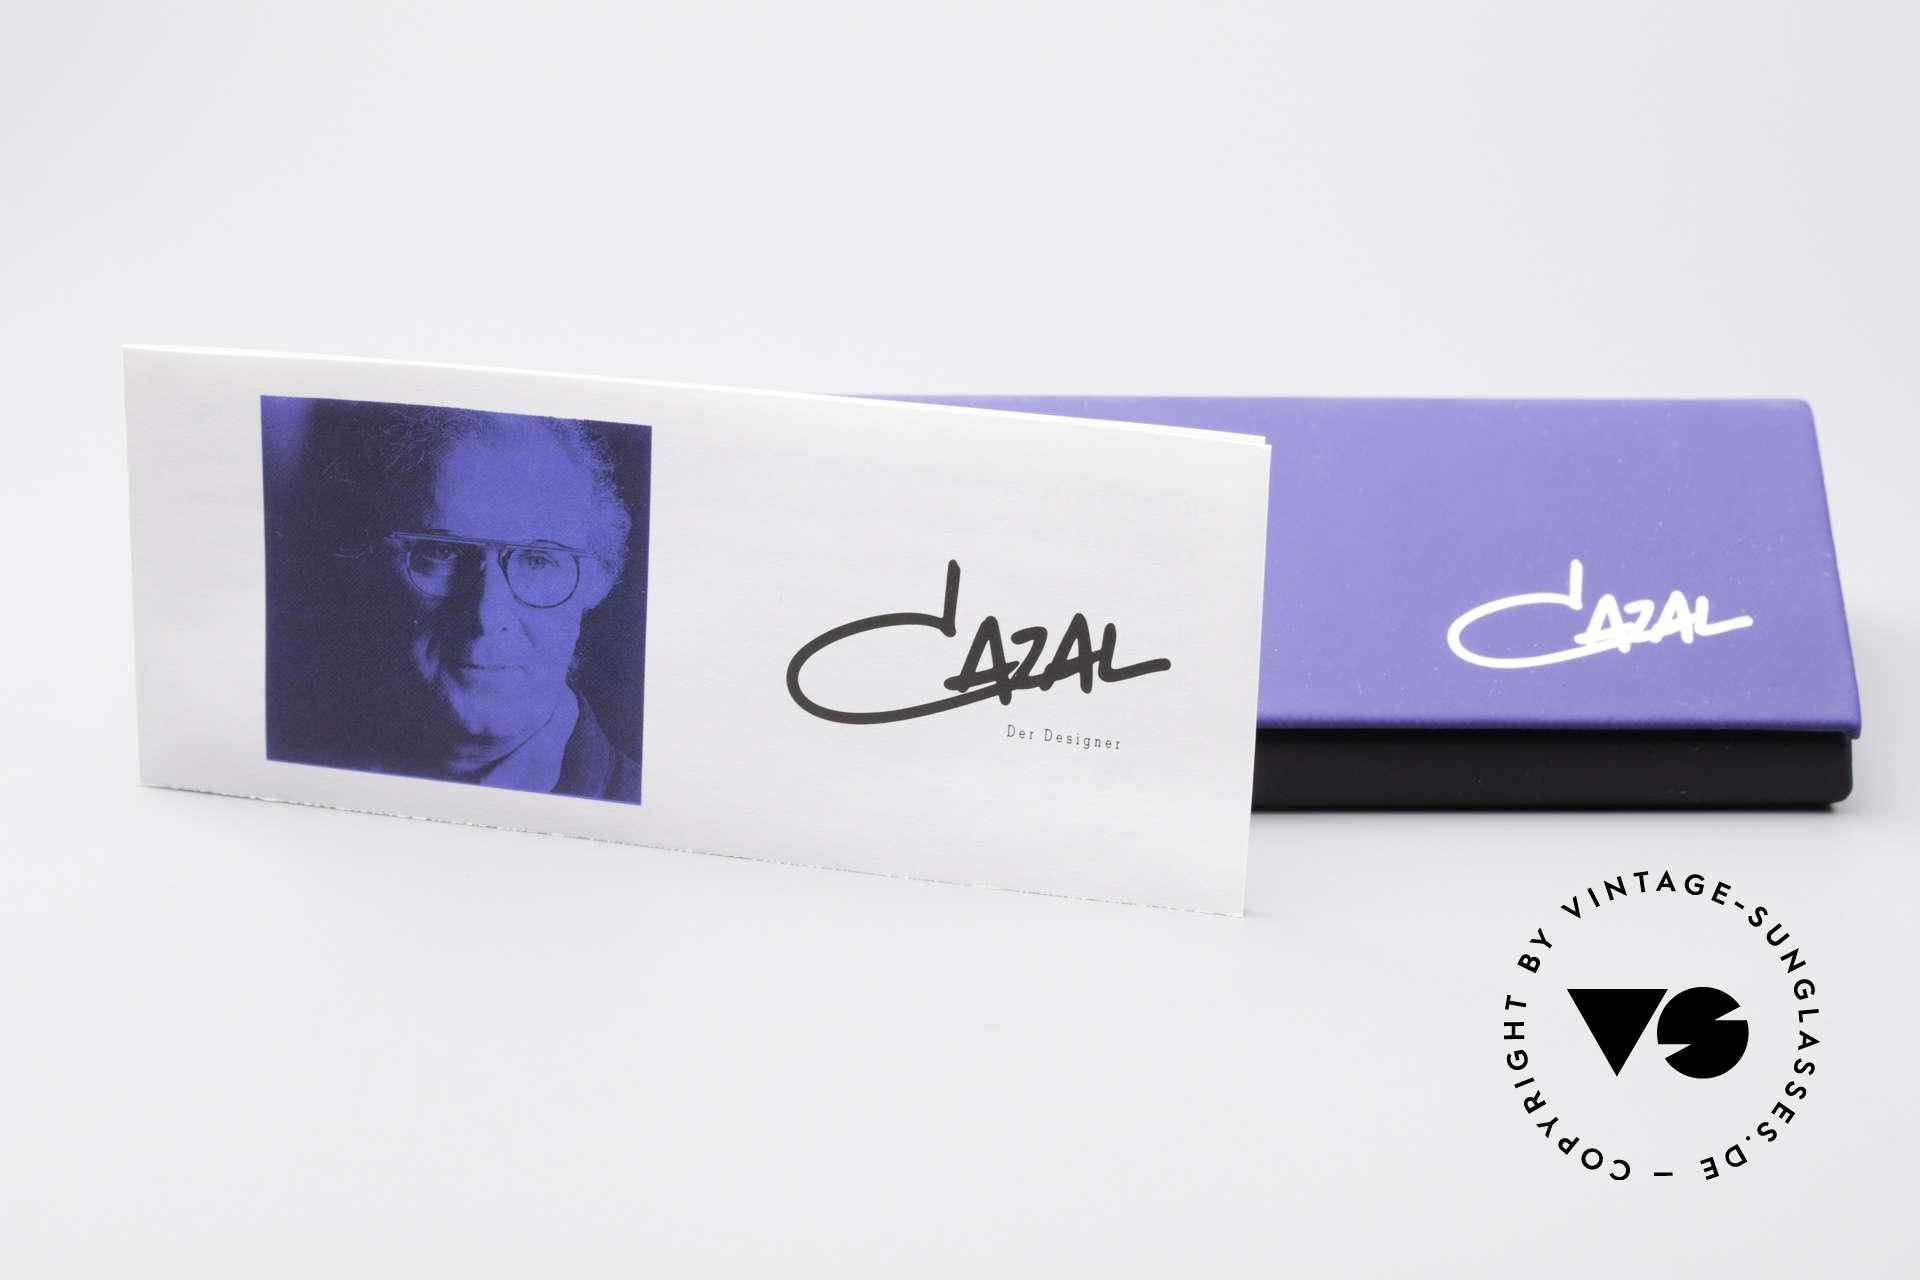 Cazal 355 Extraordinary Sunglasses 90's, Size: small, Made for Women